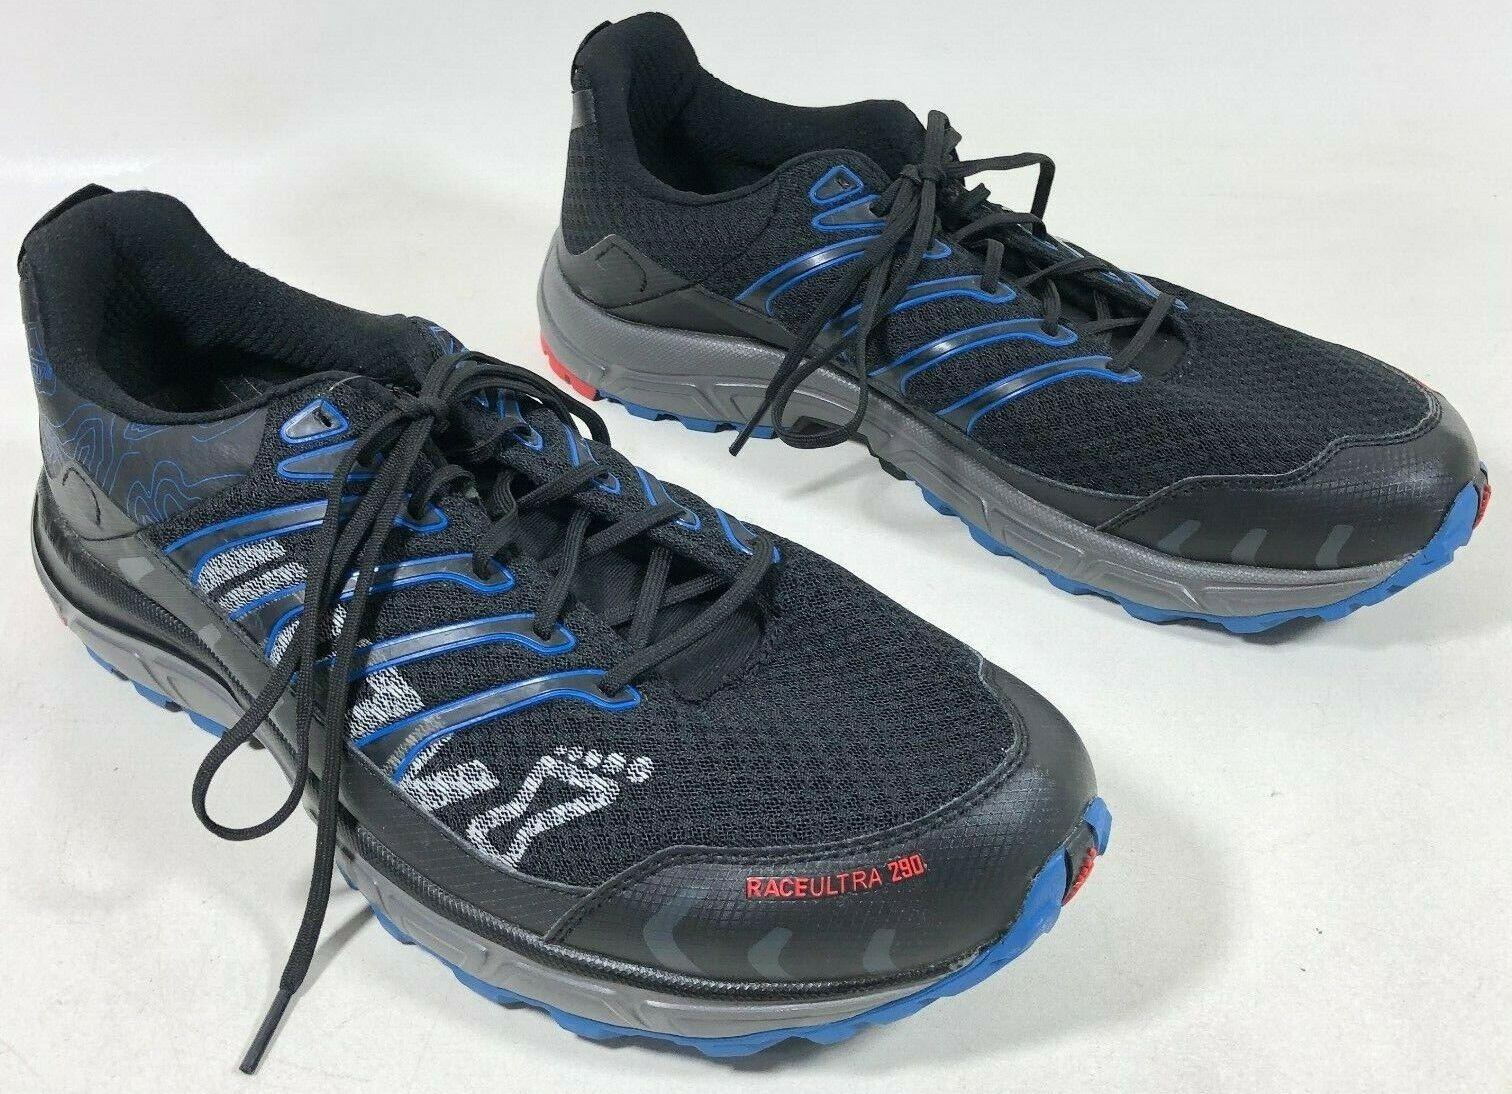 Inov - 8 X-Static Race Ultra 290 Running boue Chaussures Chaussures Chaussures Flex Noir Bleu Homme 11.5 neuf sans boîte  bon shopping